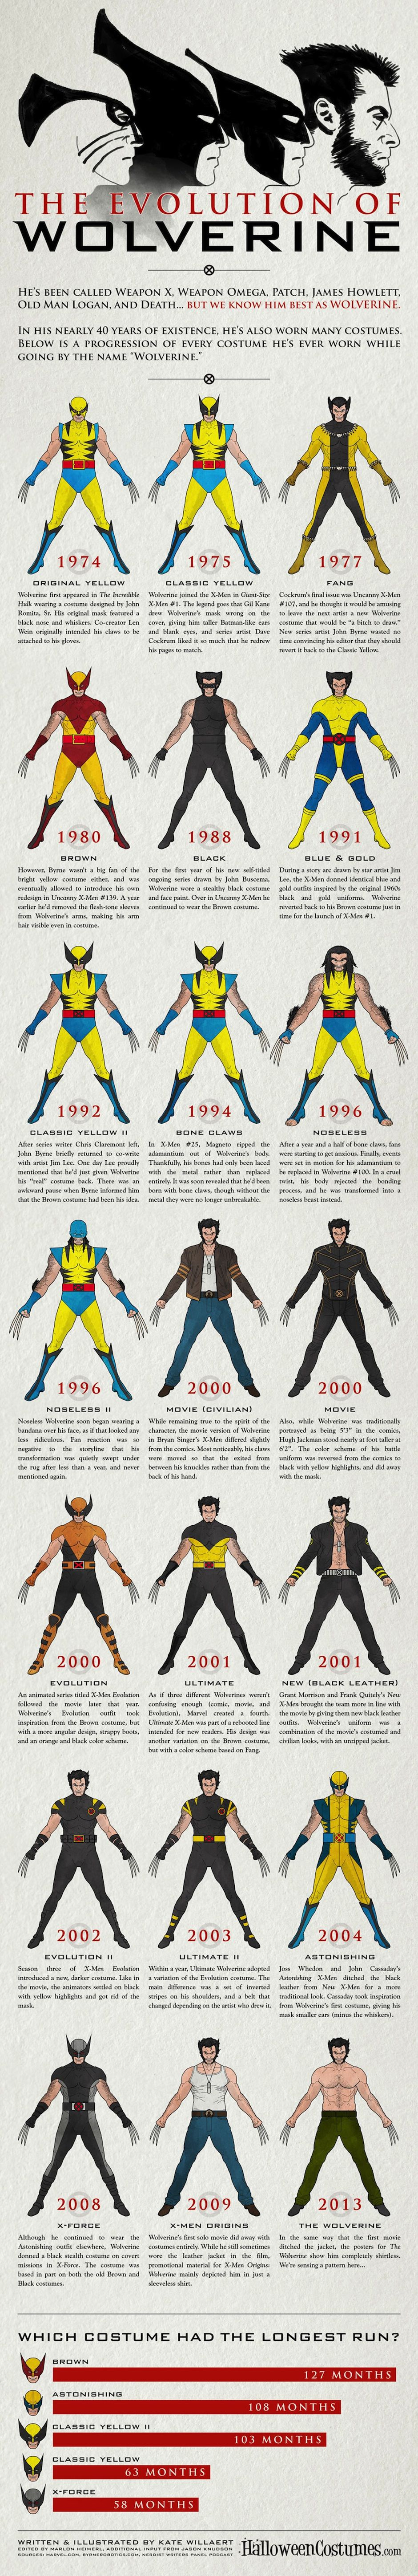 Evolucao do Wolverine